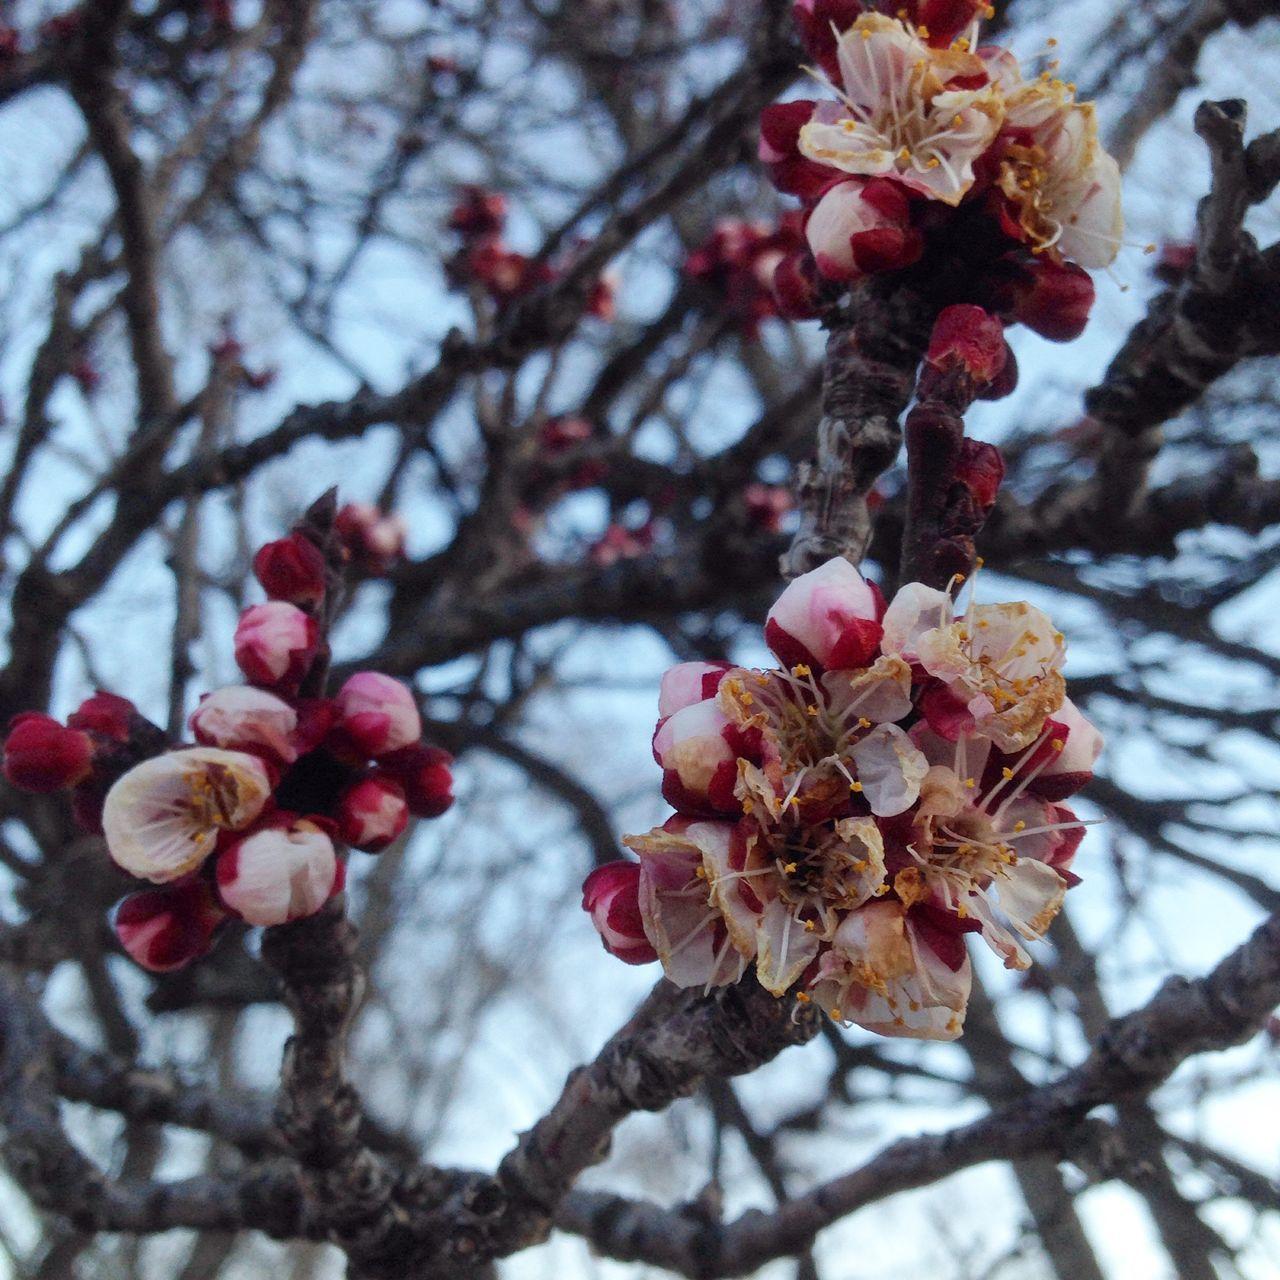 Apricot Promises Still Life GE's Santa Fe Diary Apricot Blossoms Happy Haiku Dreaming